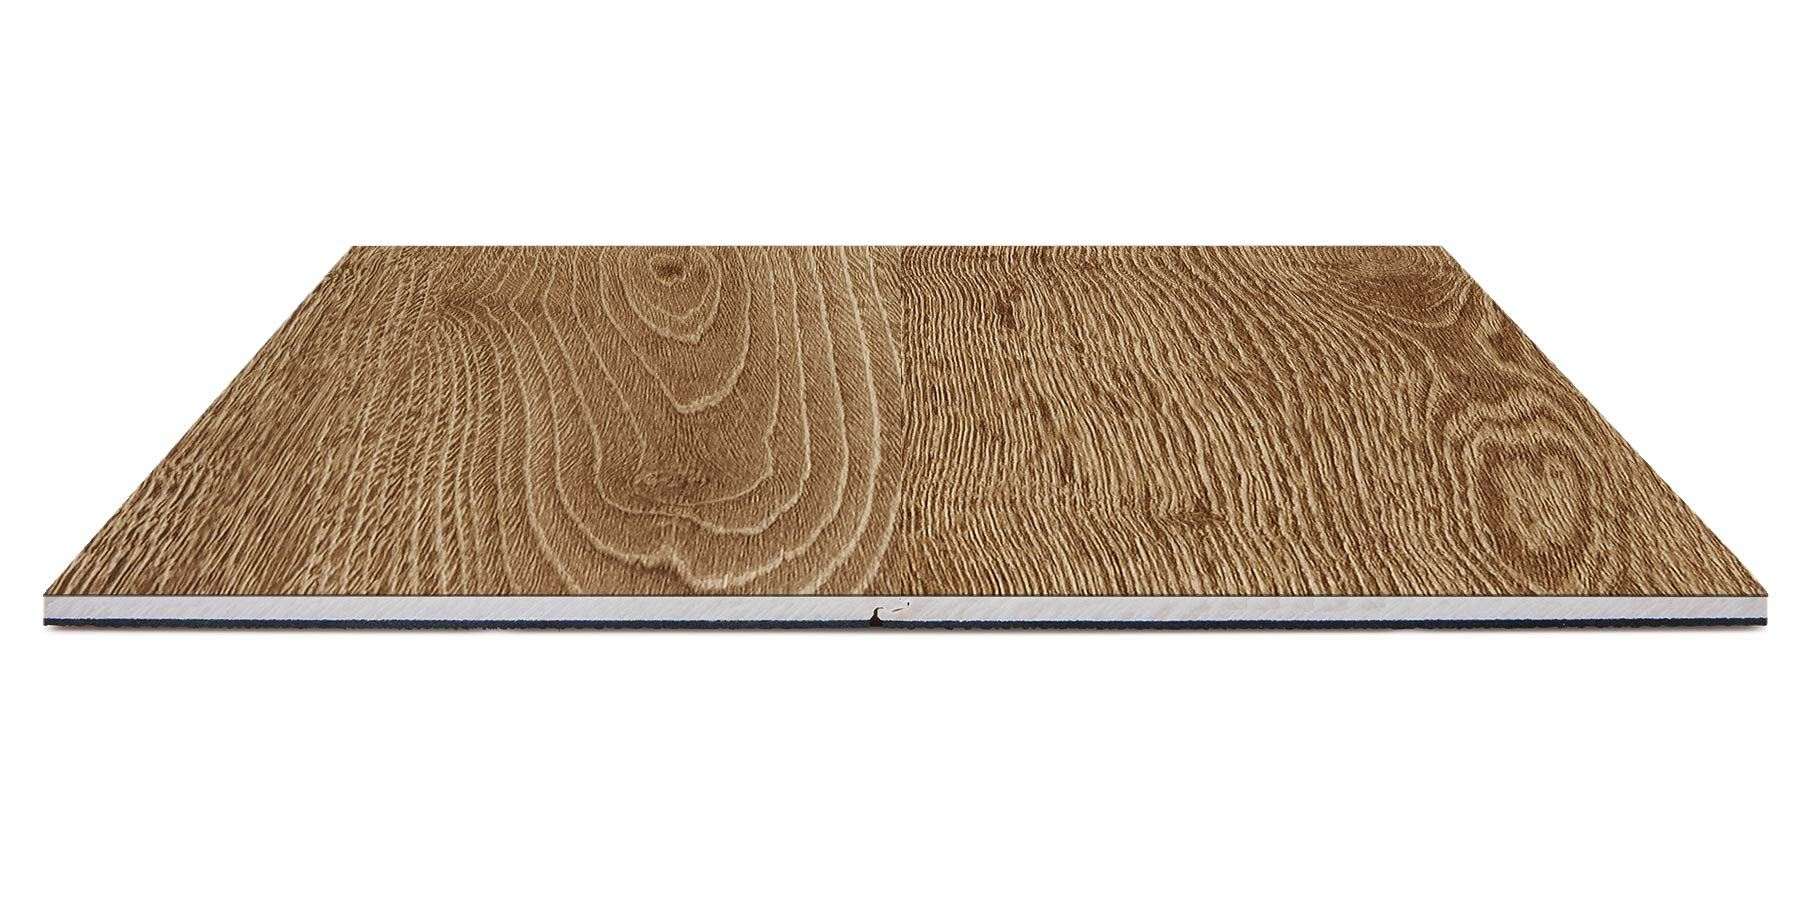 Highland Park Vinyl Plank Flooring